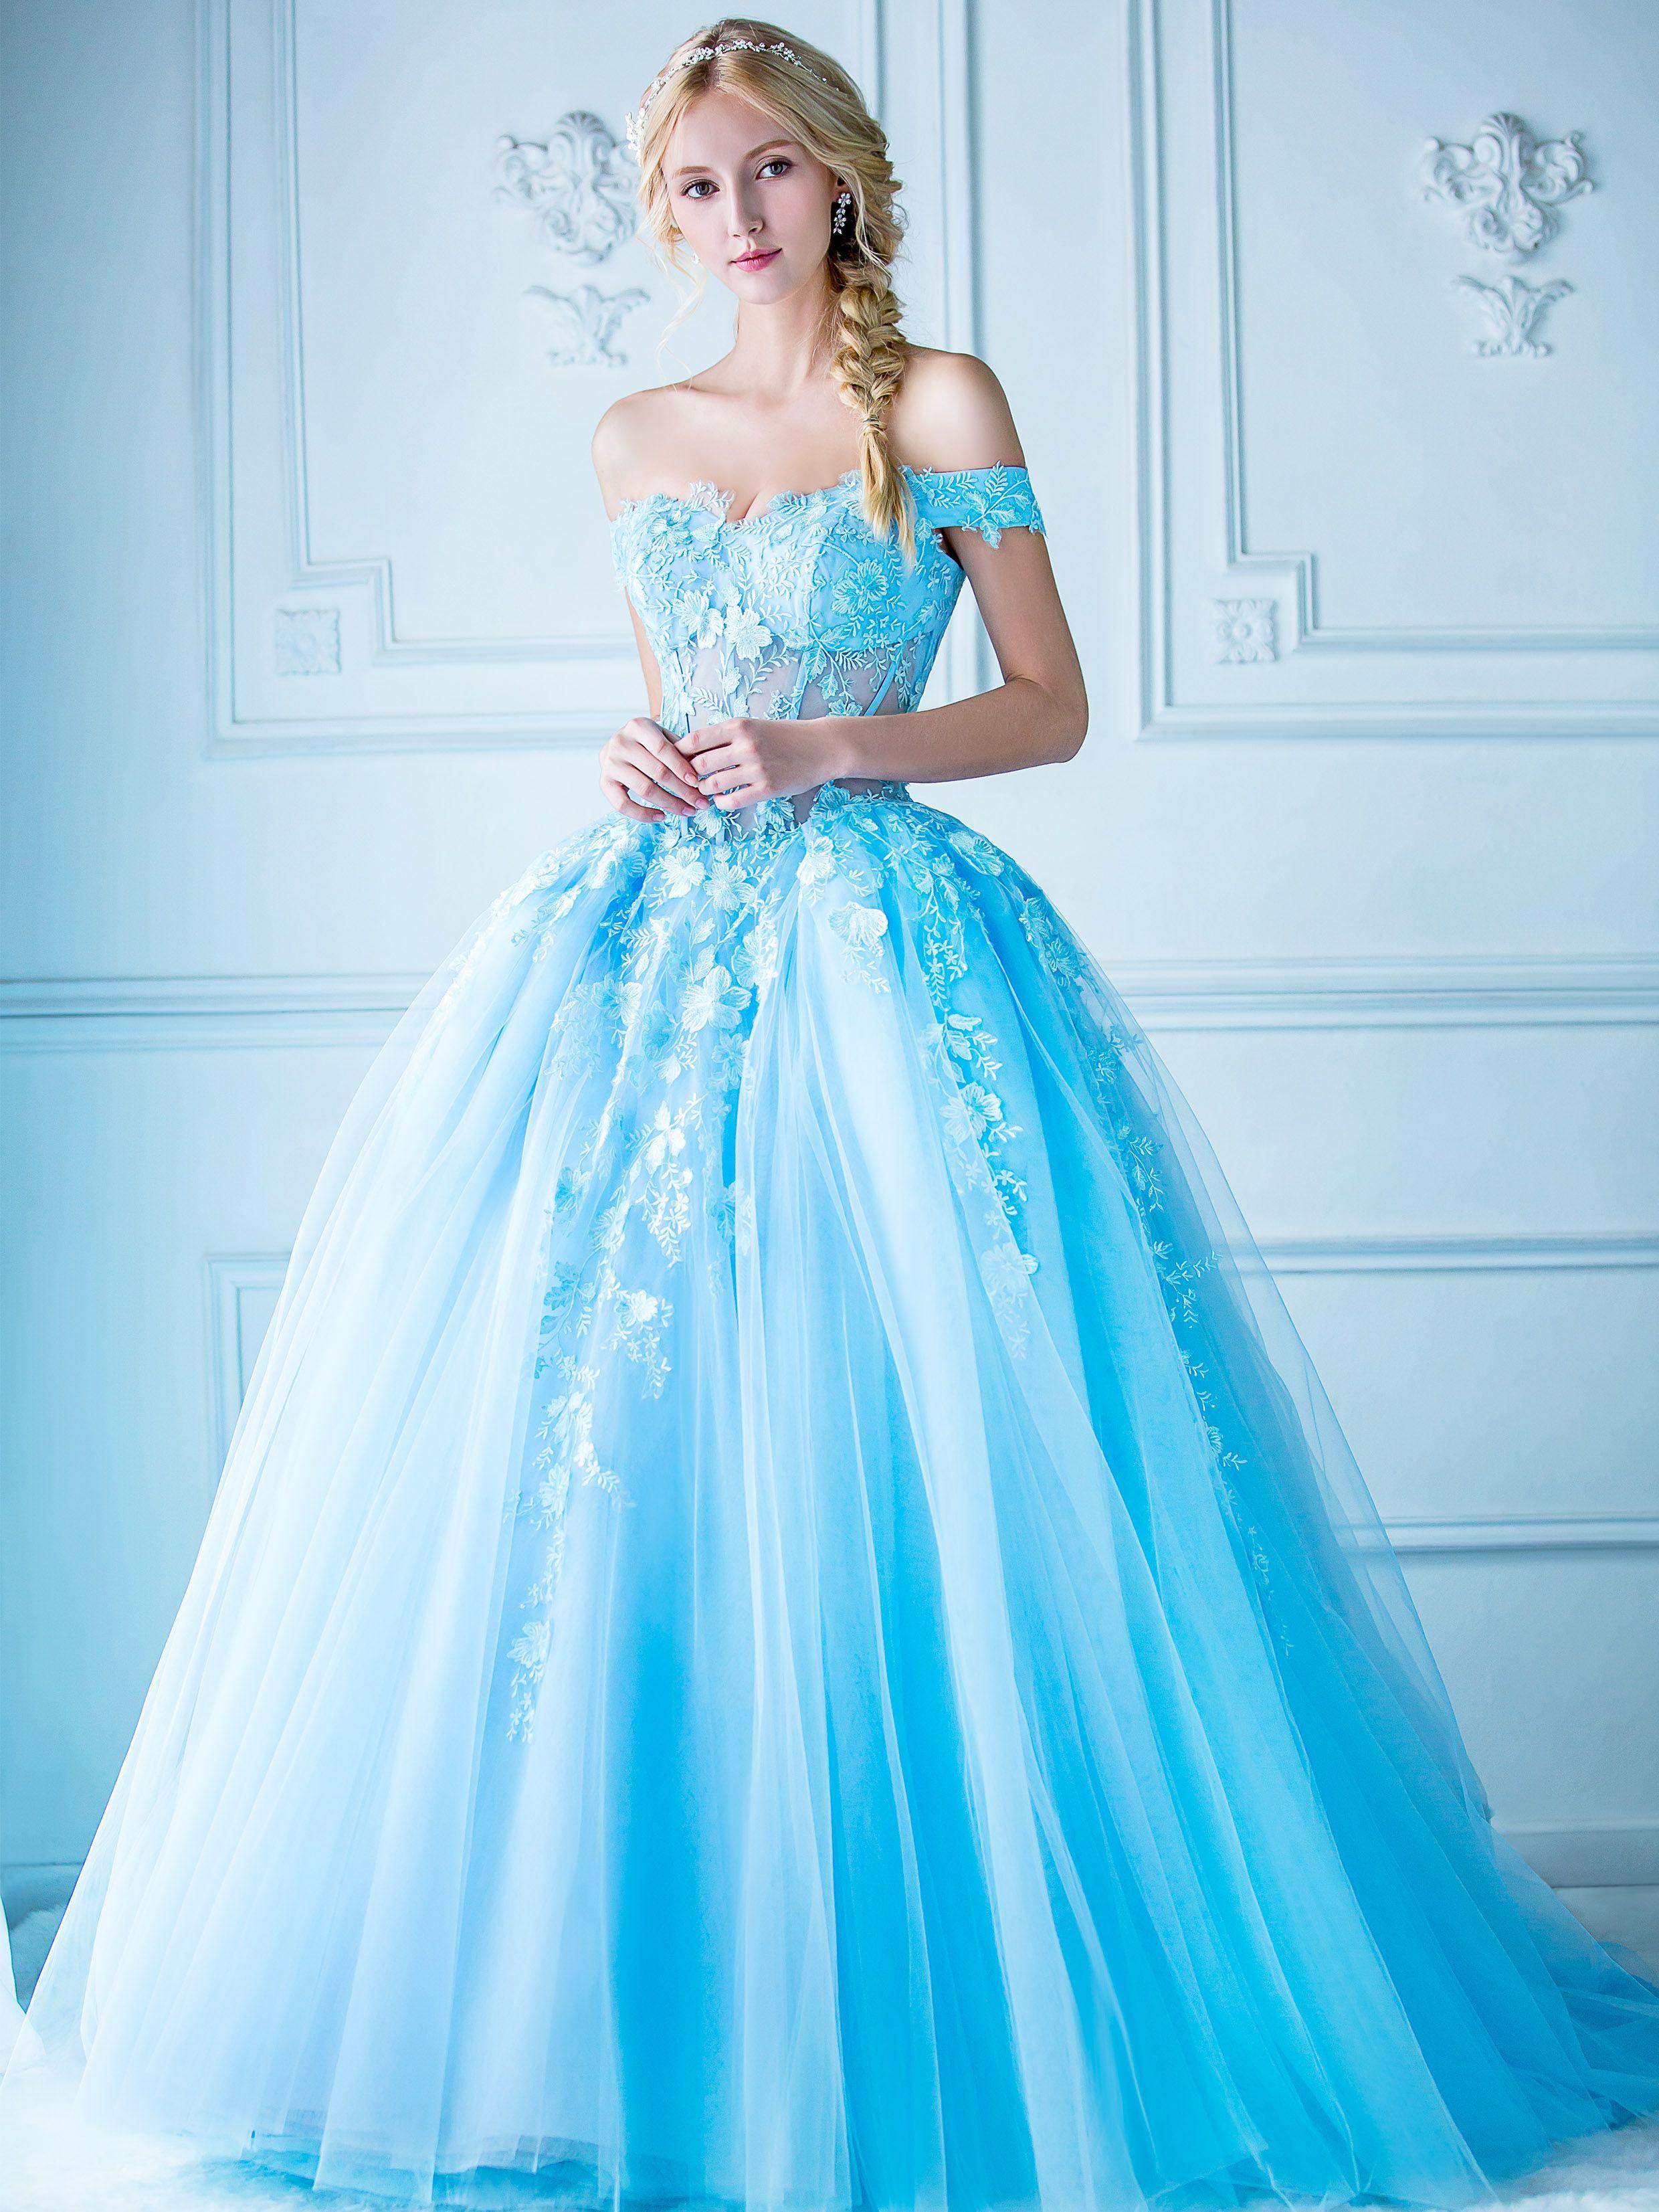 Colorful Dreams - Digio Bridal | 드레스 | Pinterest | Prom, Gowns ...